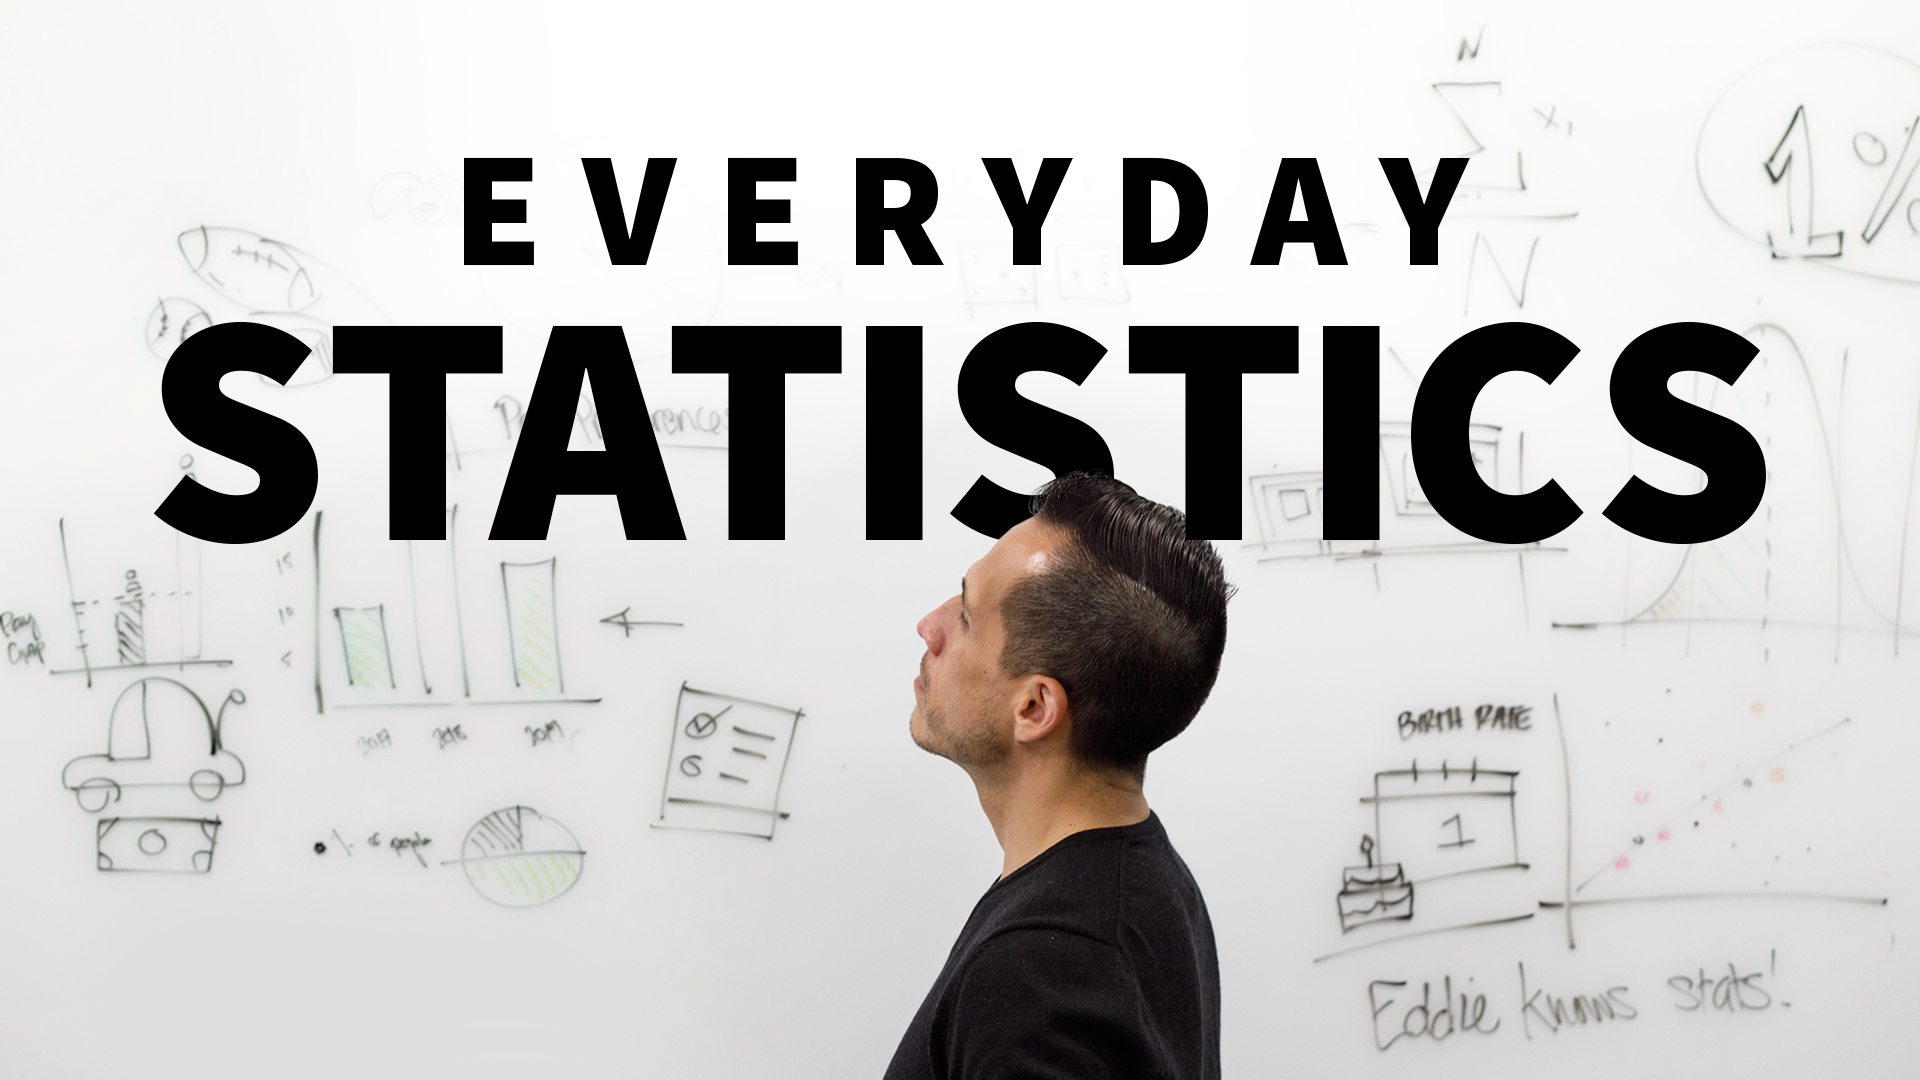 Income tax statistics: Everyday Statistics, with Eddie Davila